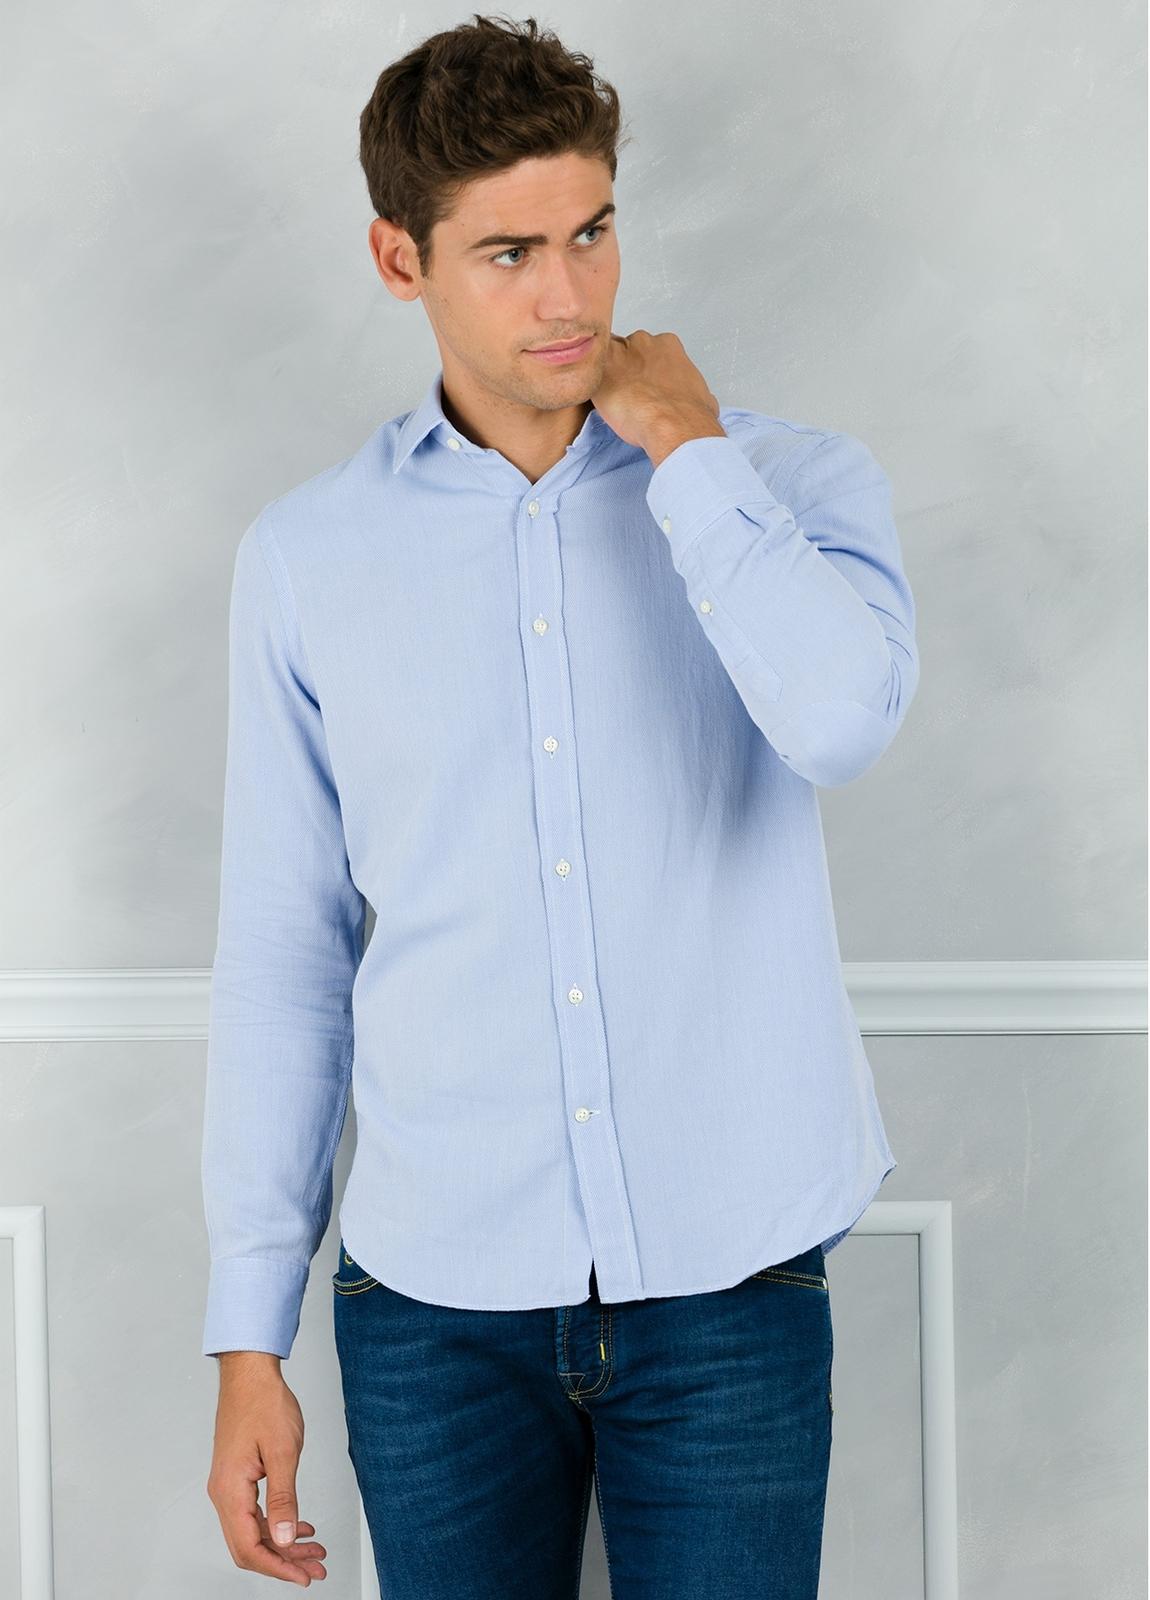 Camisa Leisure Wear REGULAR FIT modelo PORTO color azul. 100% Algodón.